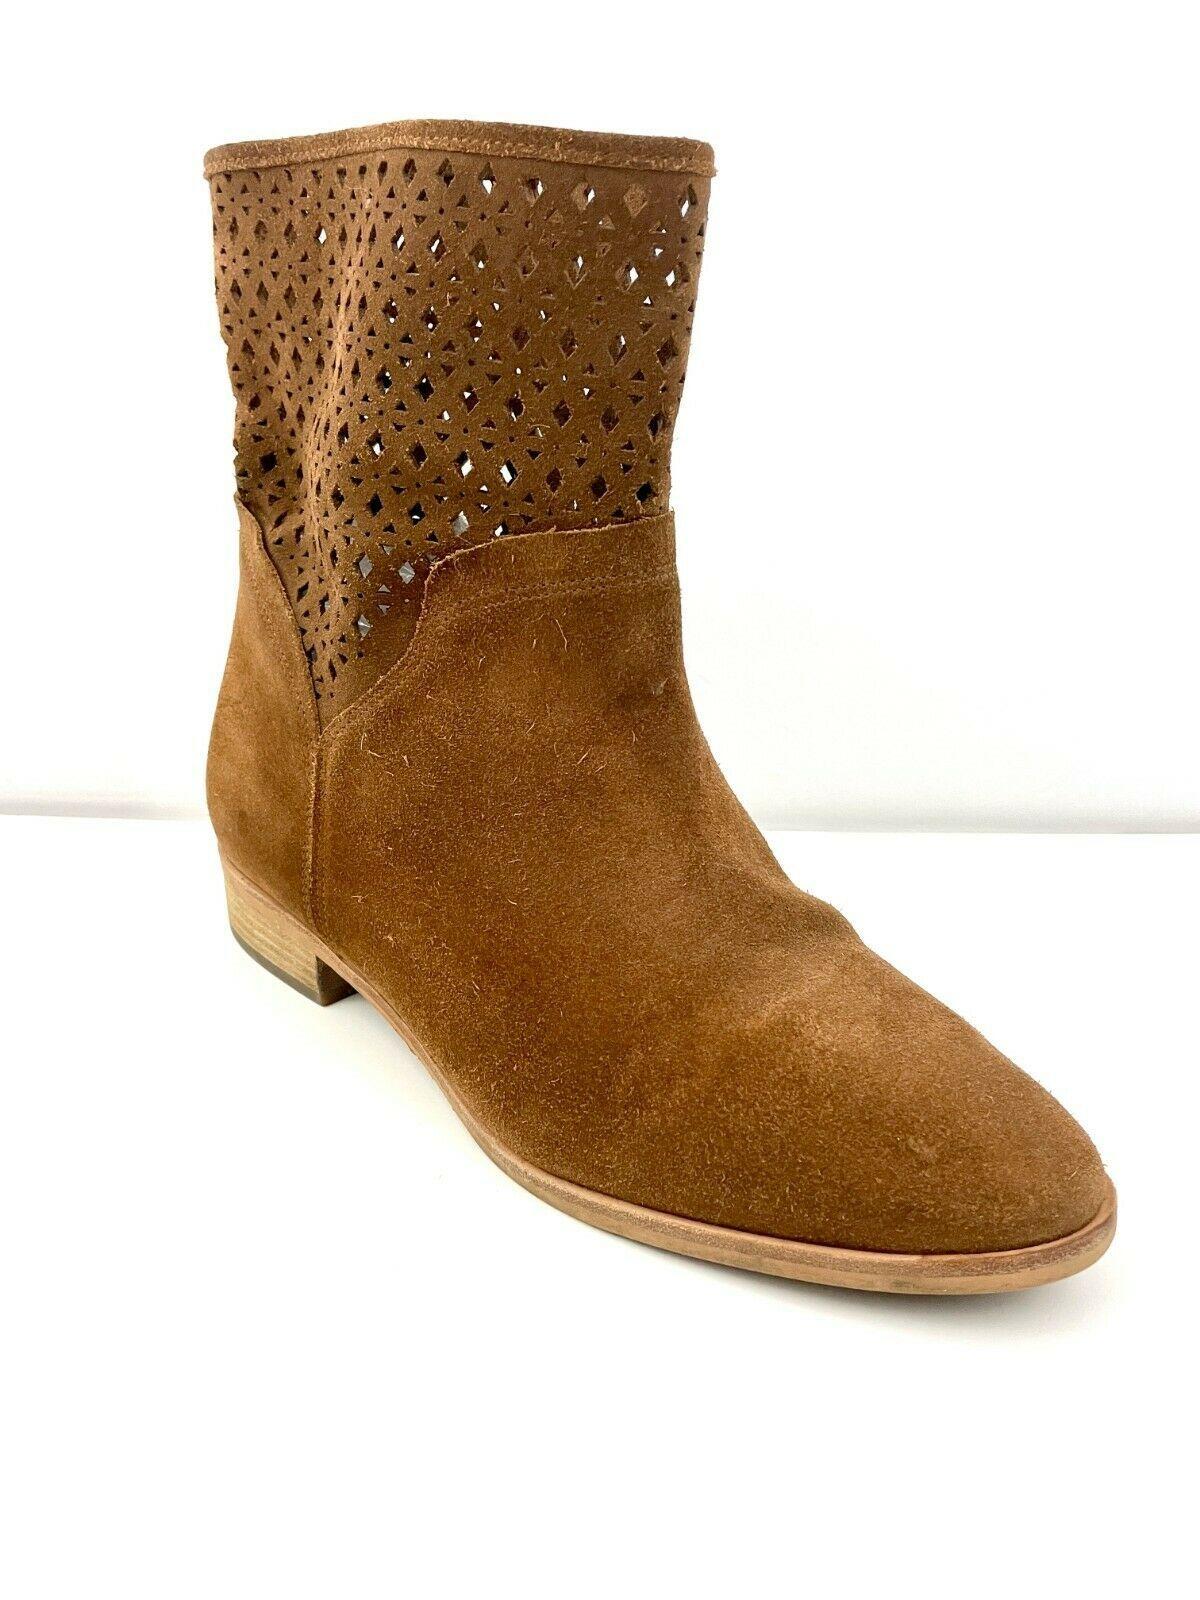 Michael Michael Kors Sunny Women's Caramel Brown Suede Bootie Sz 9 M - $31.79